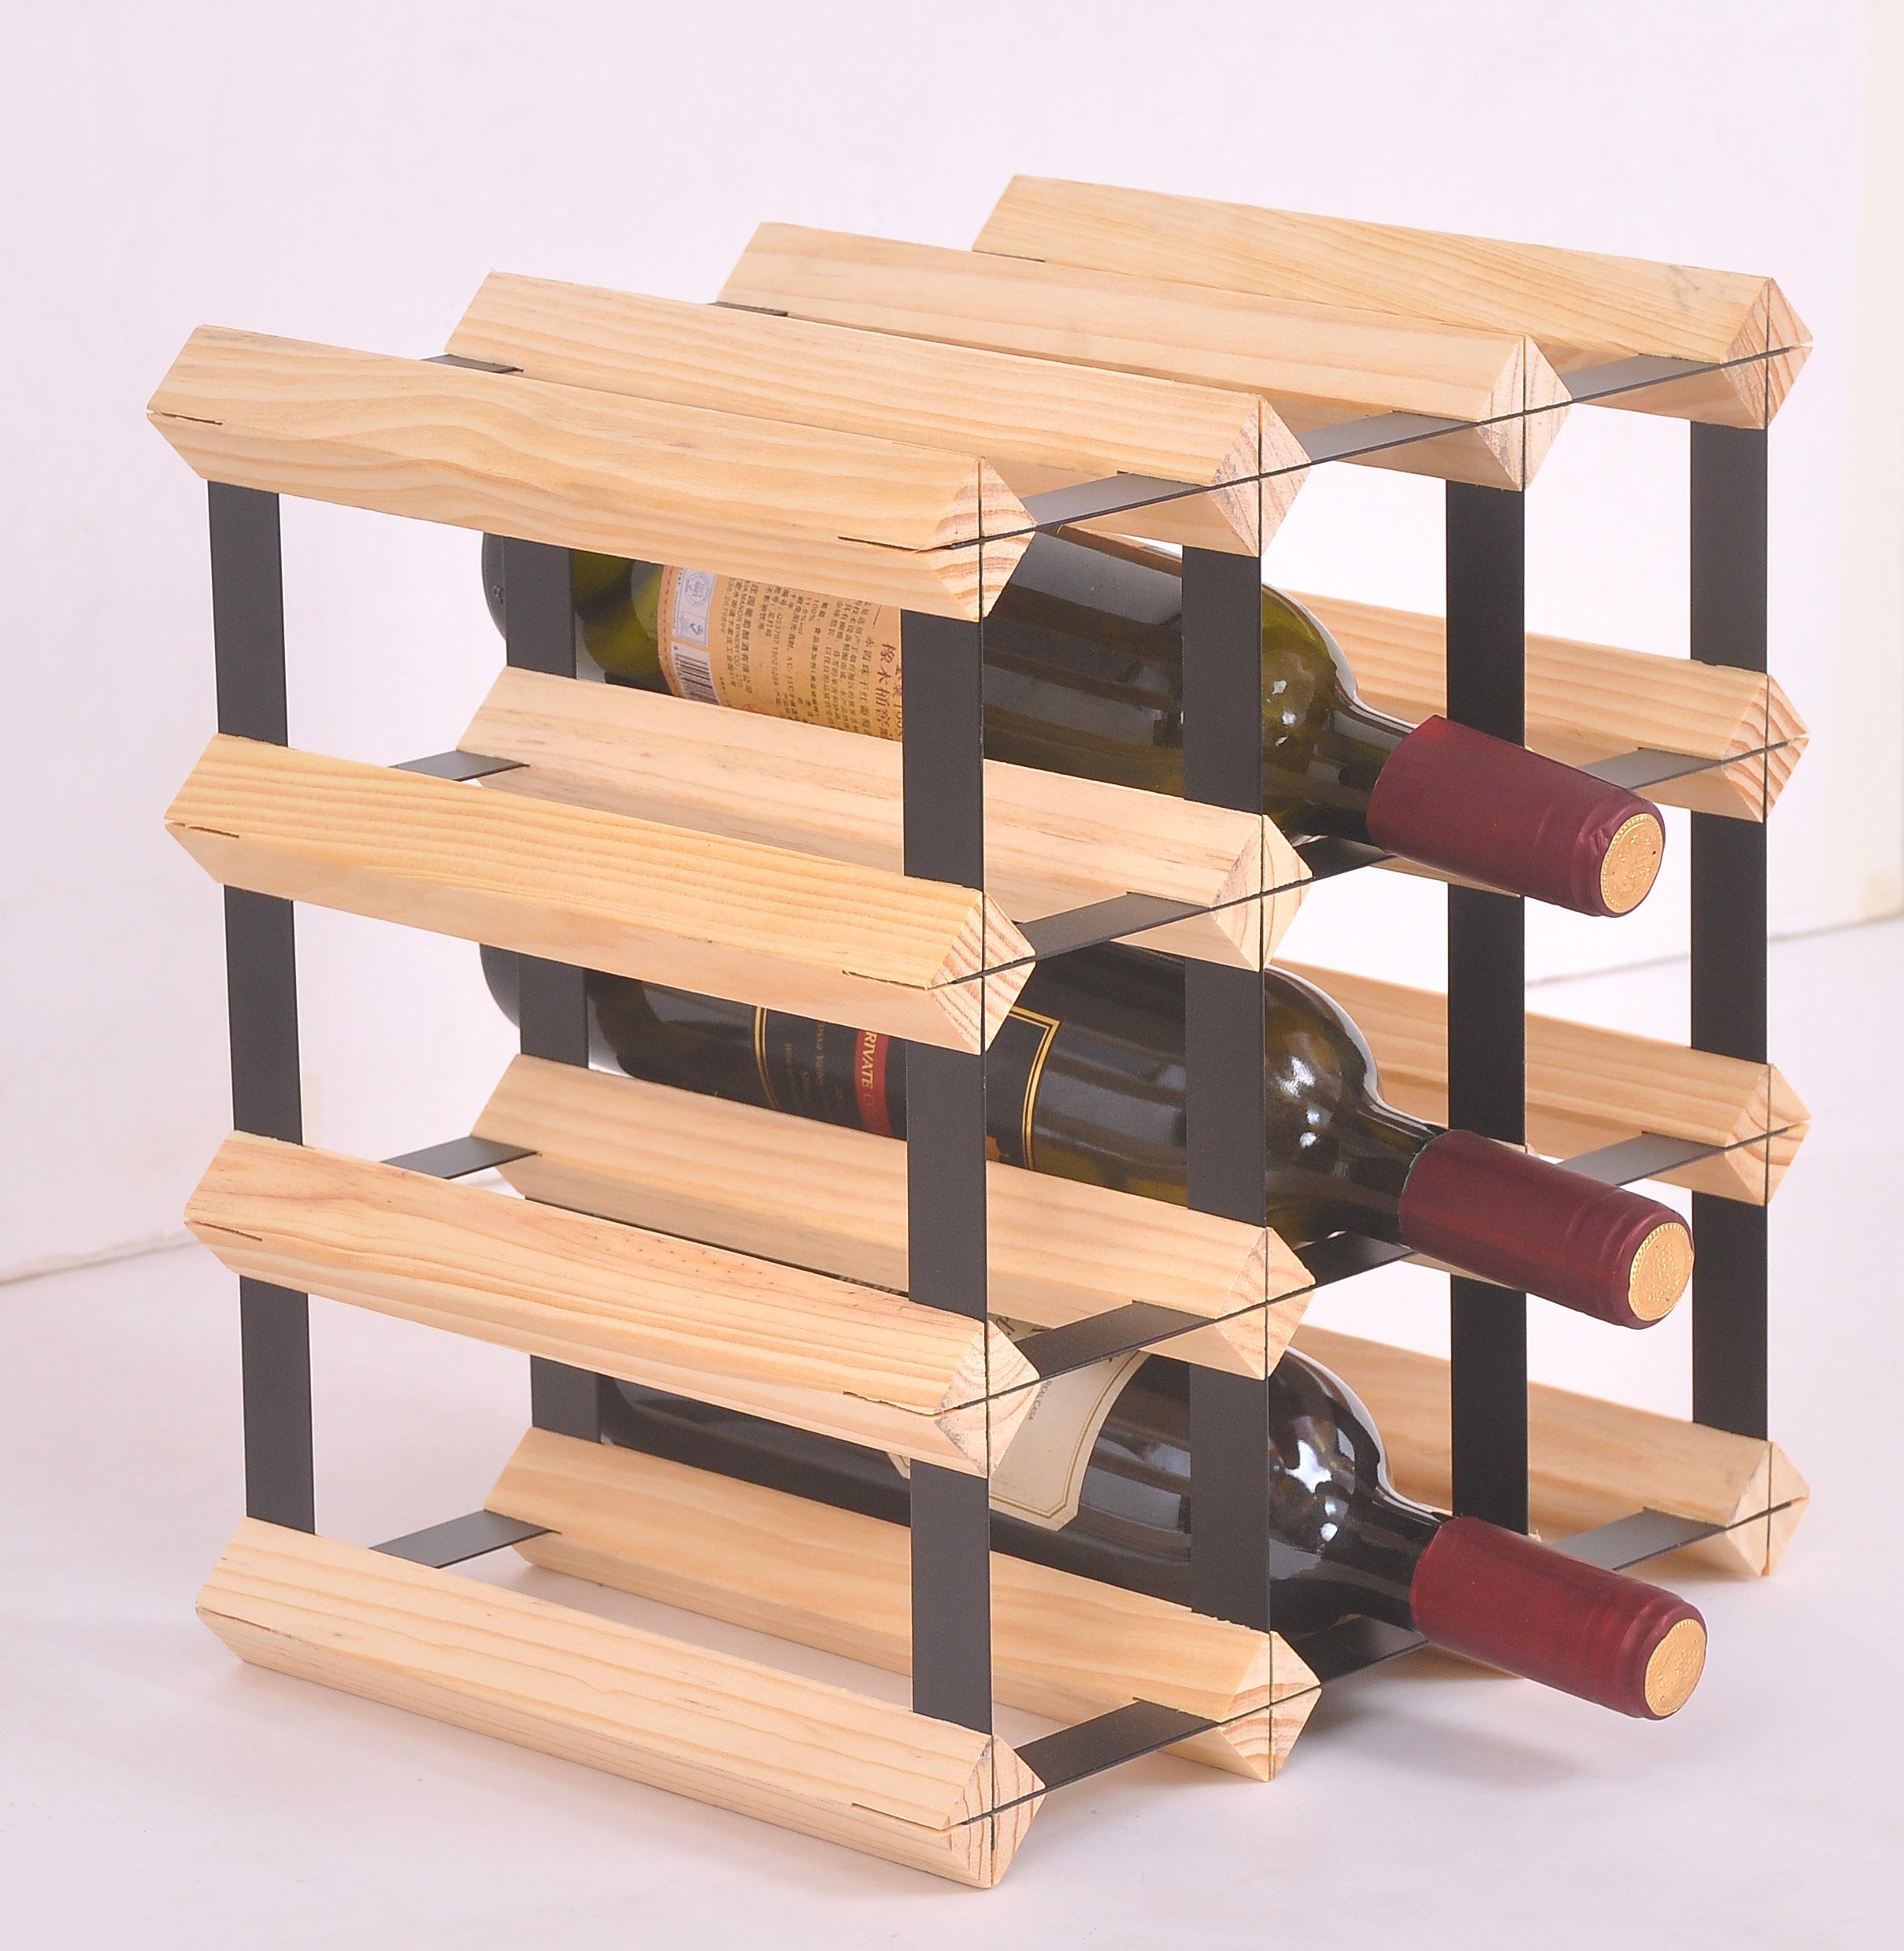 12 Bottle Timber Wine Rack - Complete Wooden Wine Storage System  Z2704